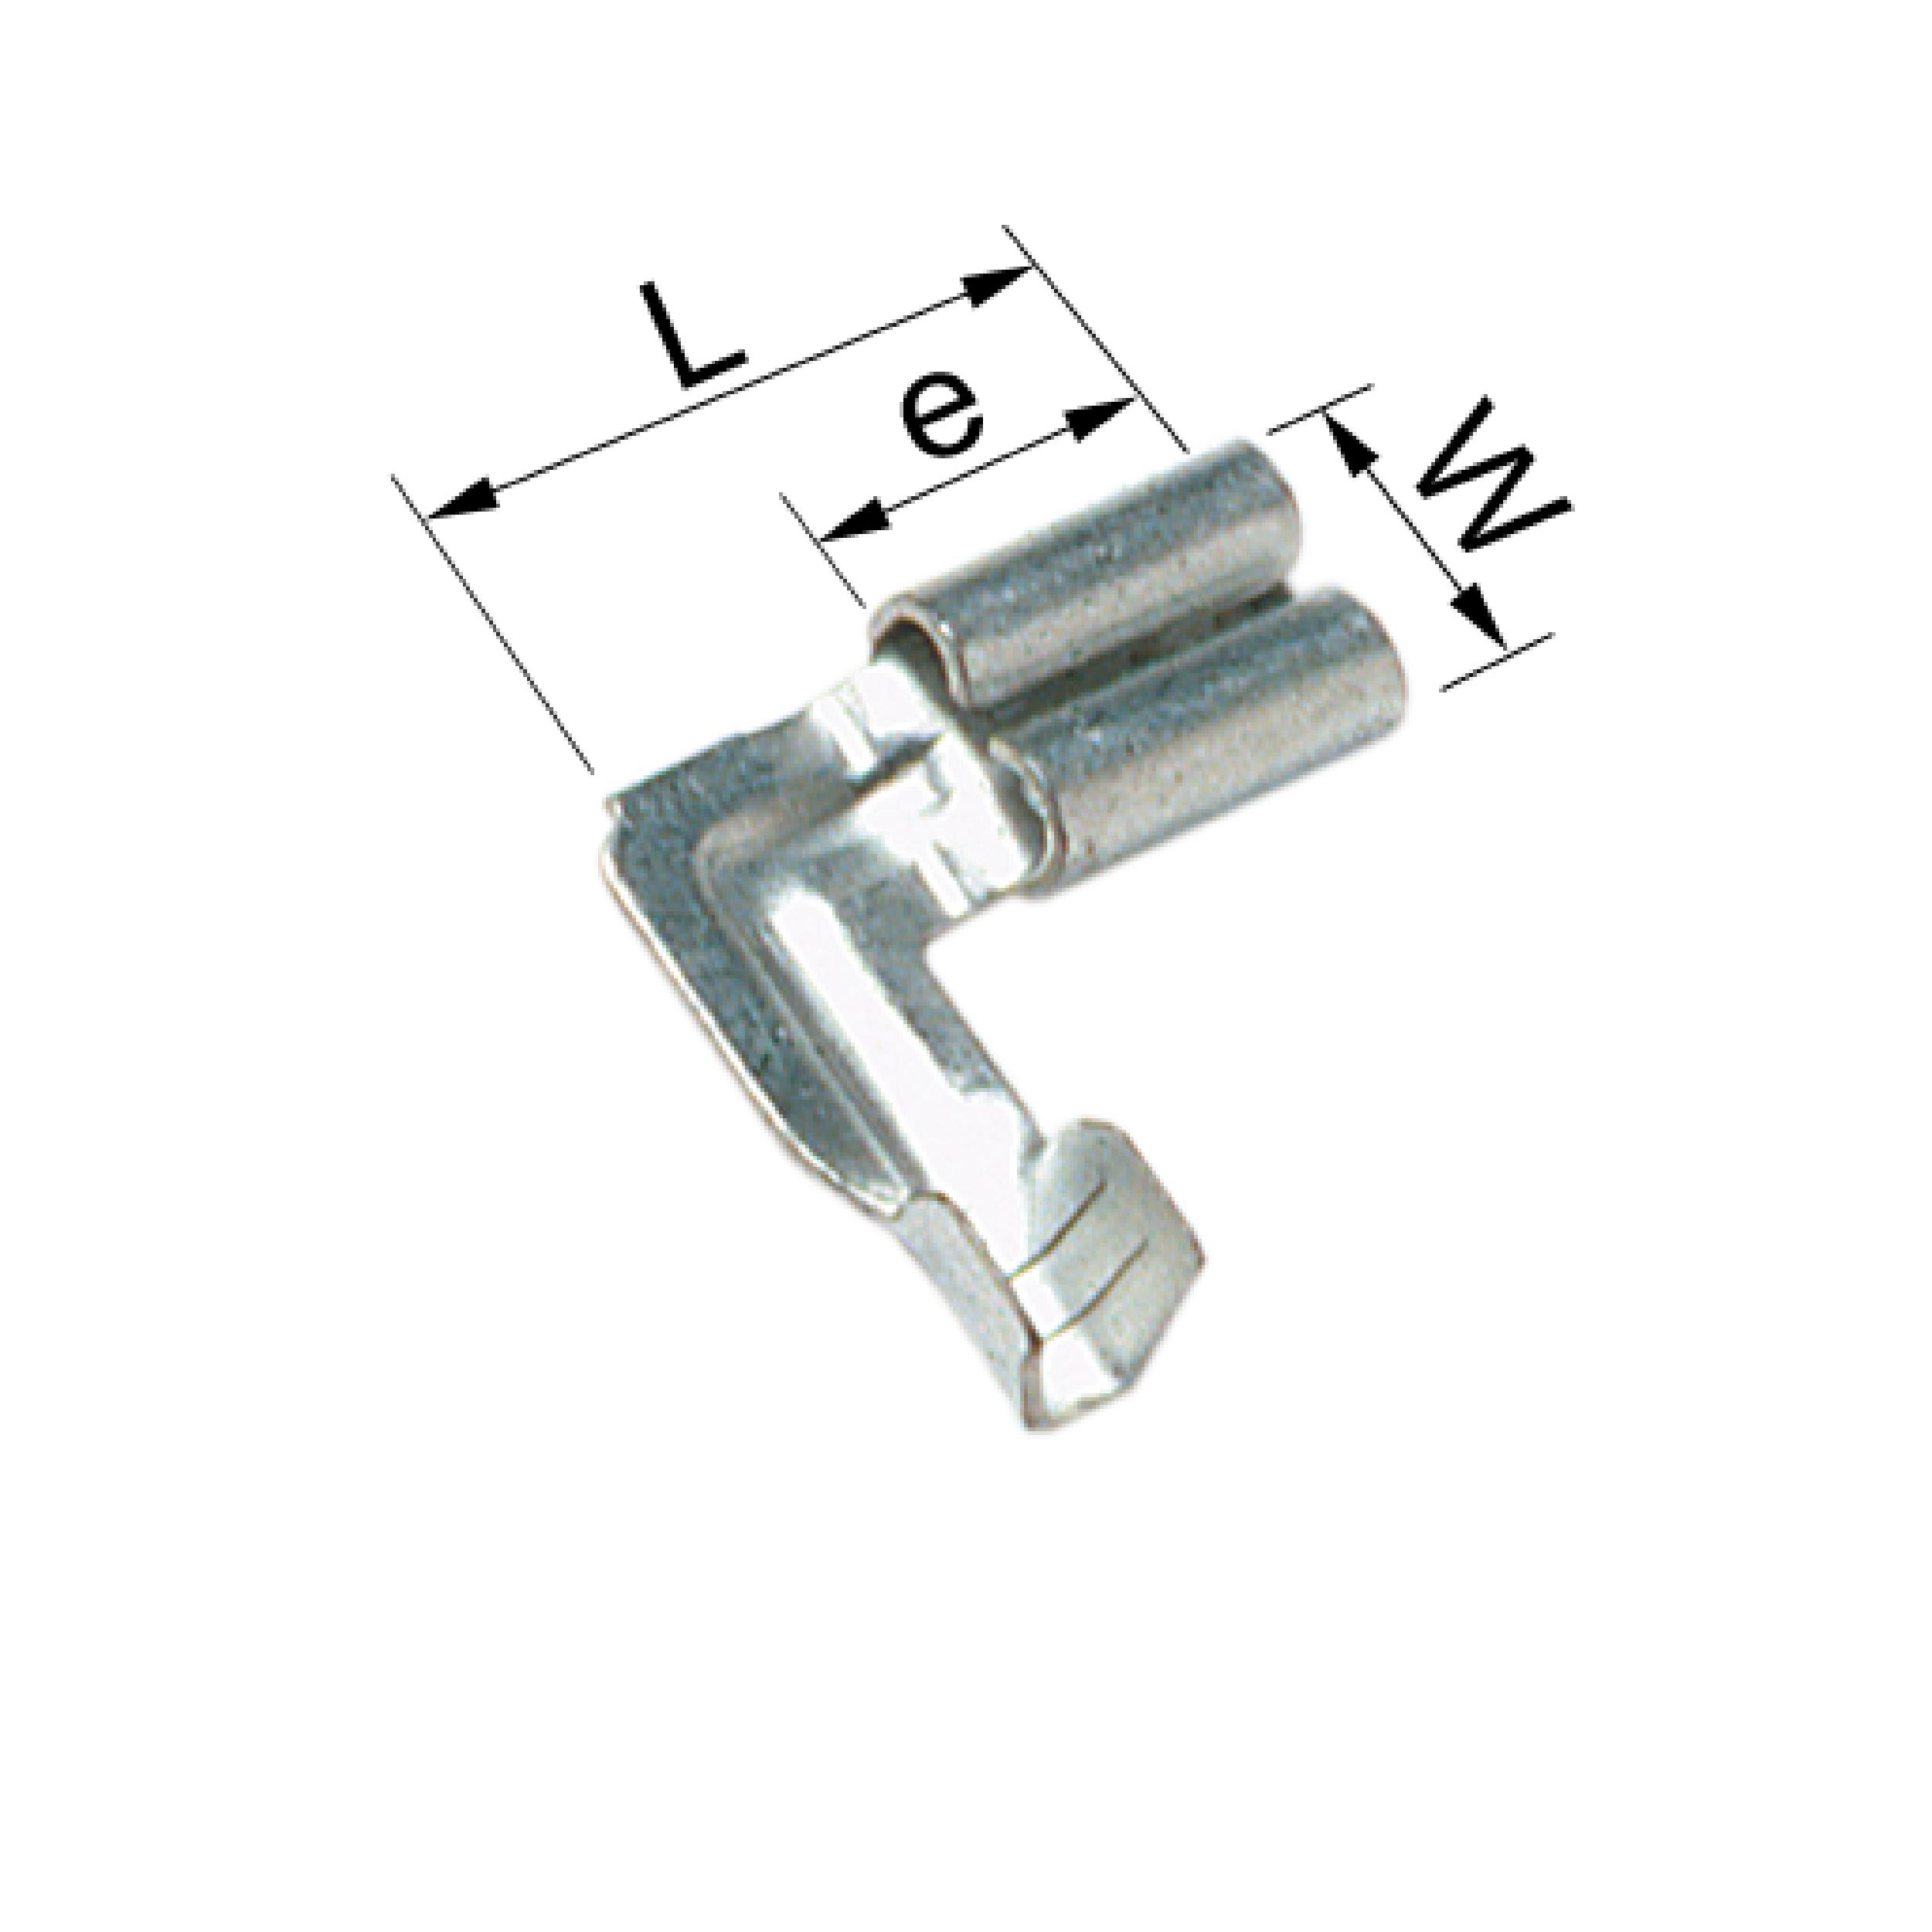 Elpress B1003FLSV5 Un-Insulated Receptacle 90° (0.5-1mm²)